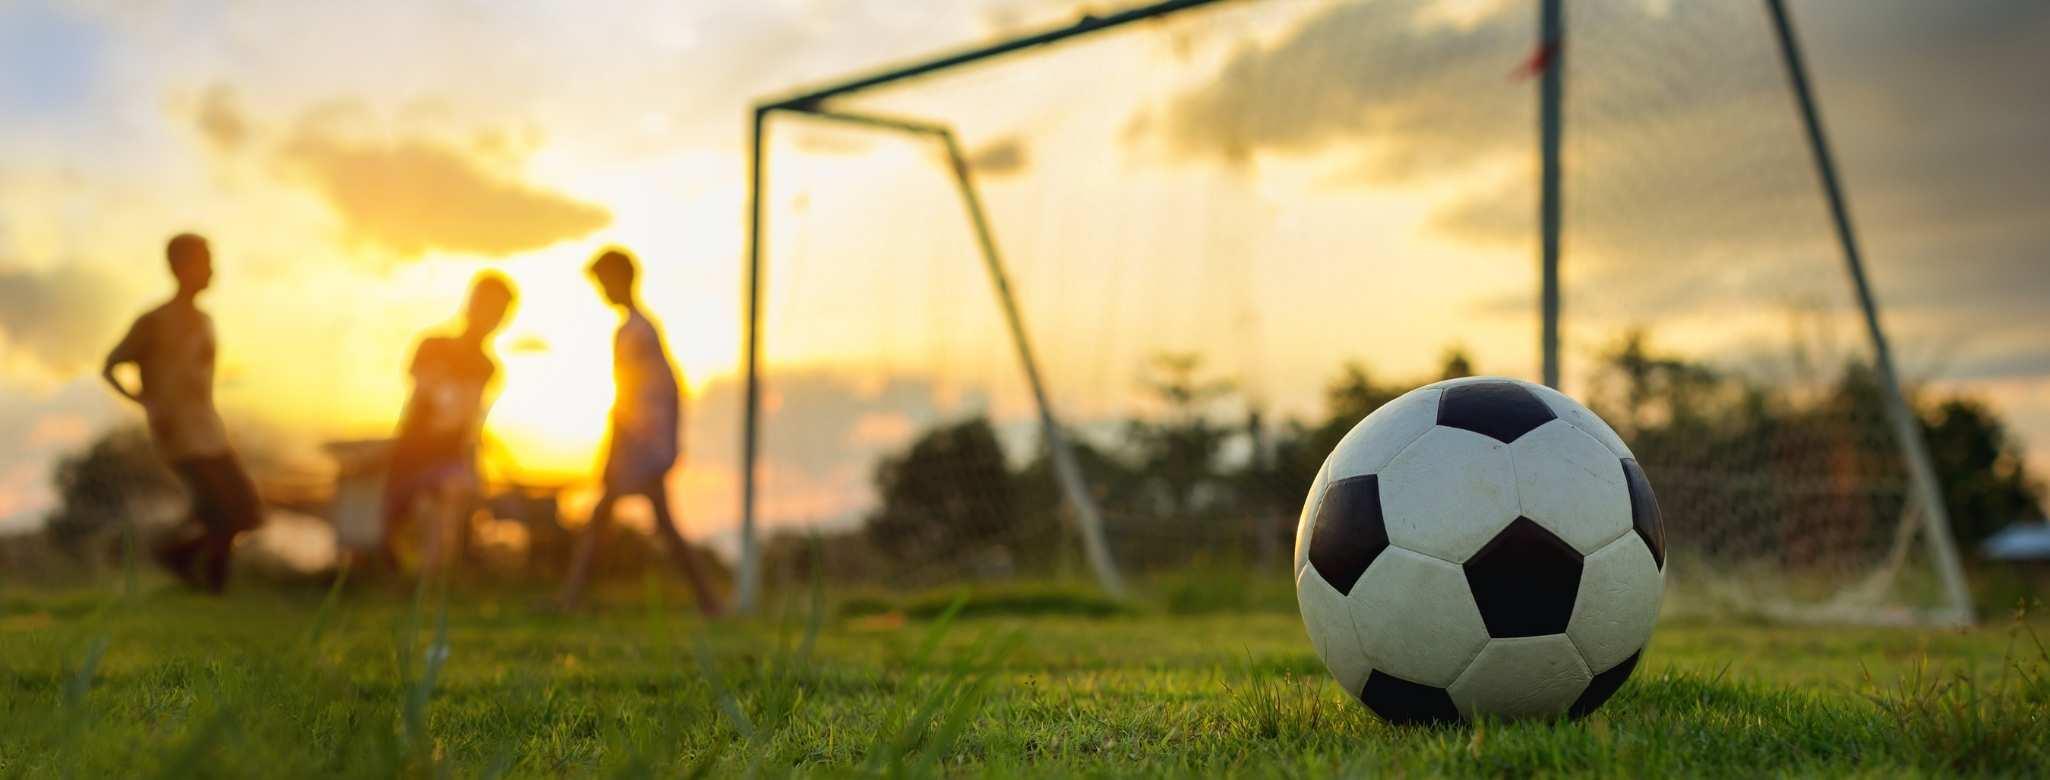 soccerheader